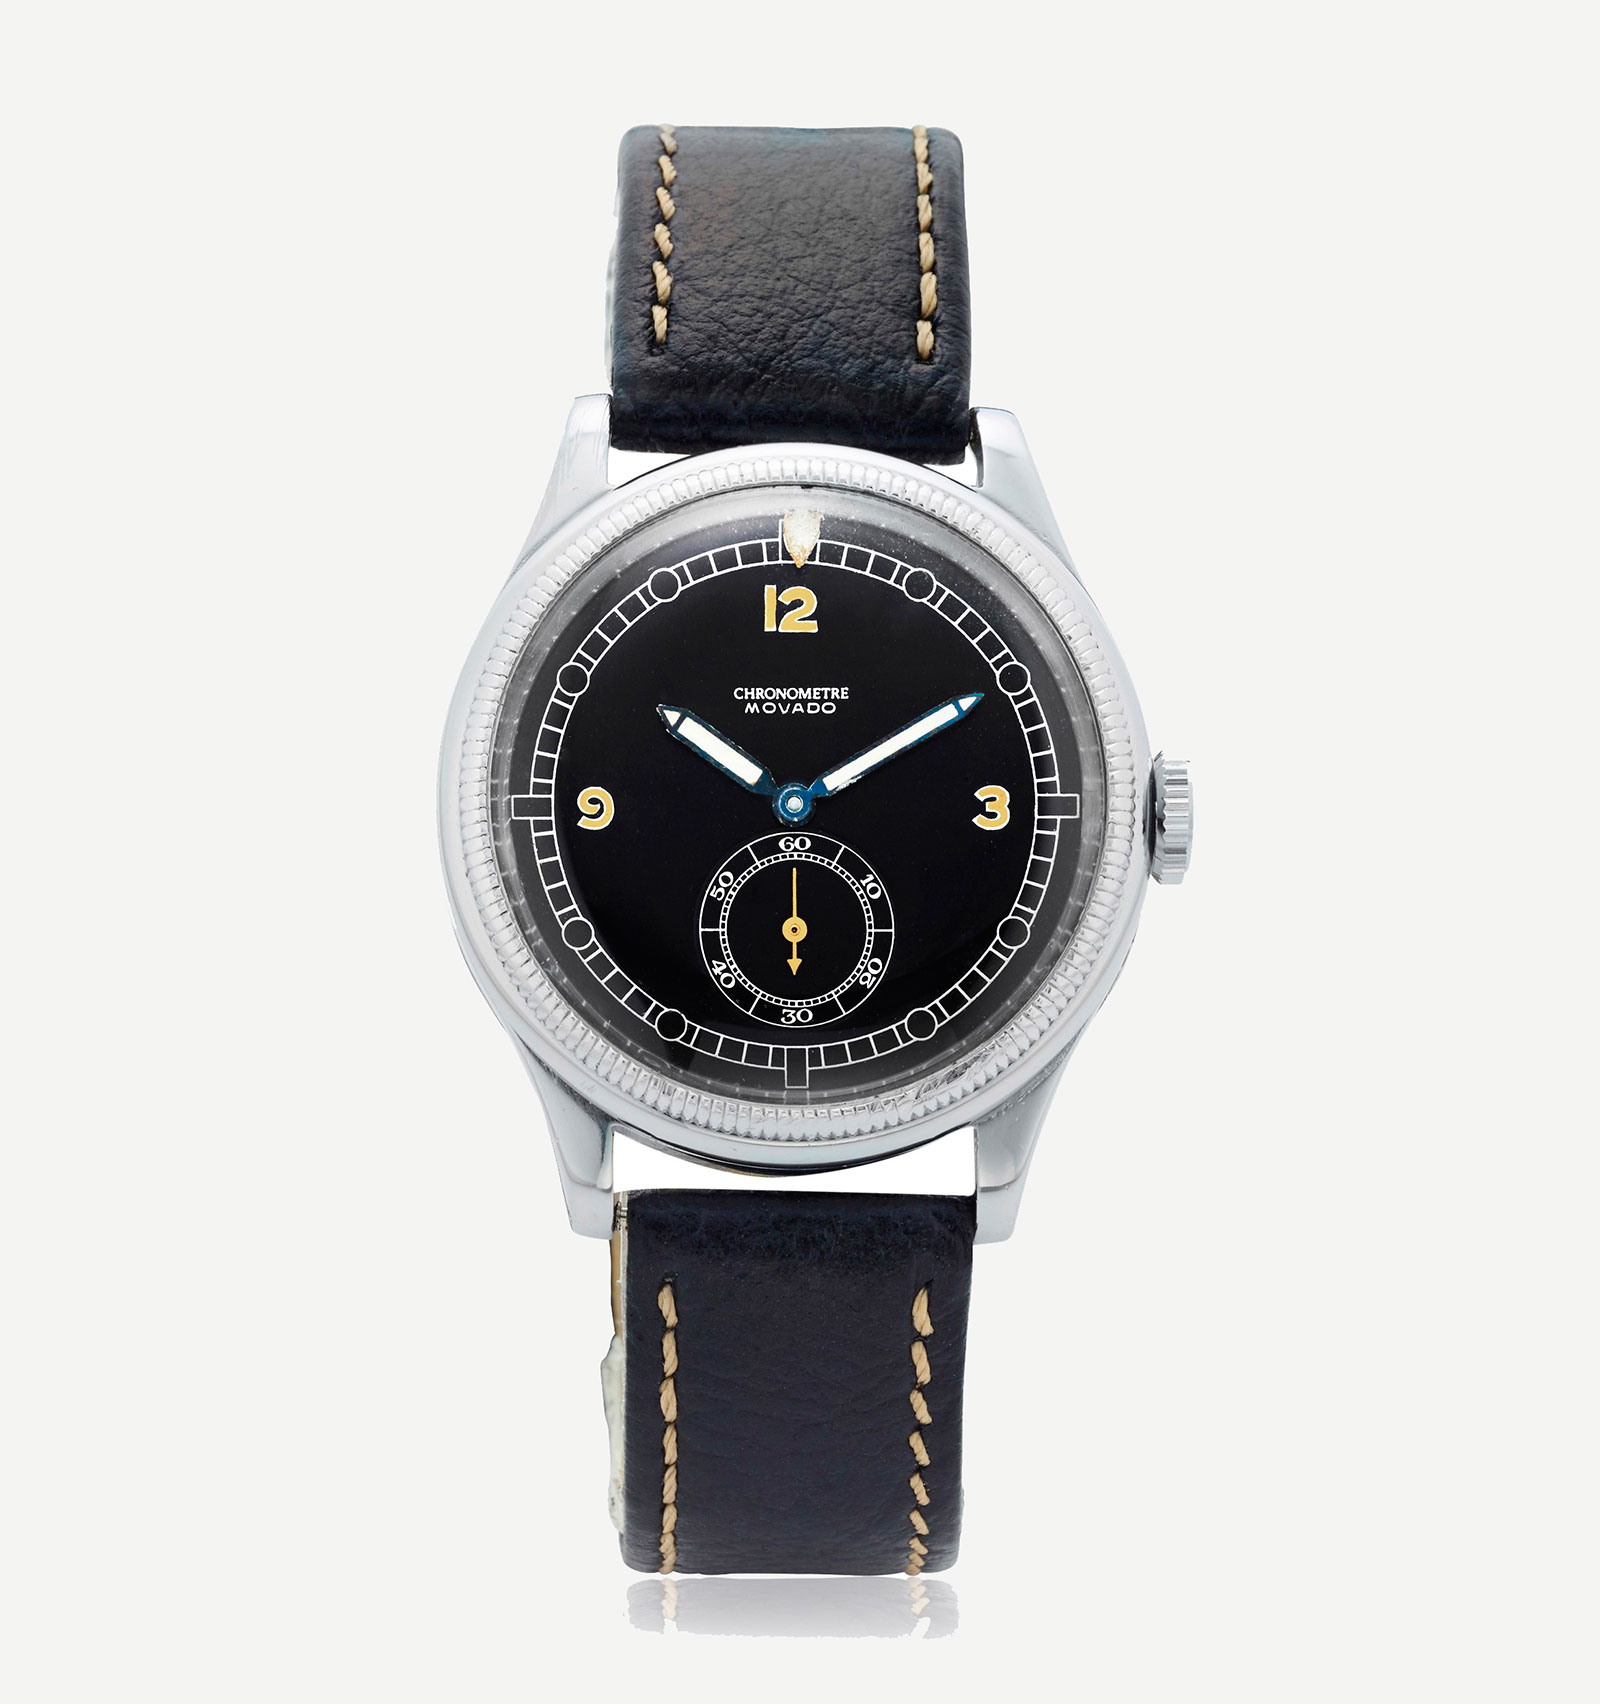 Christie's Online Movado Pilots Chronometer